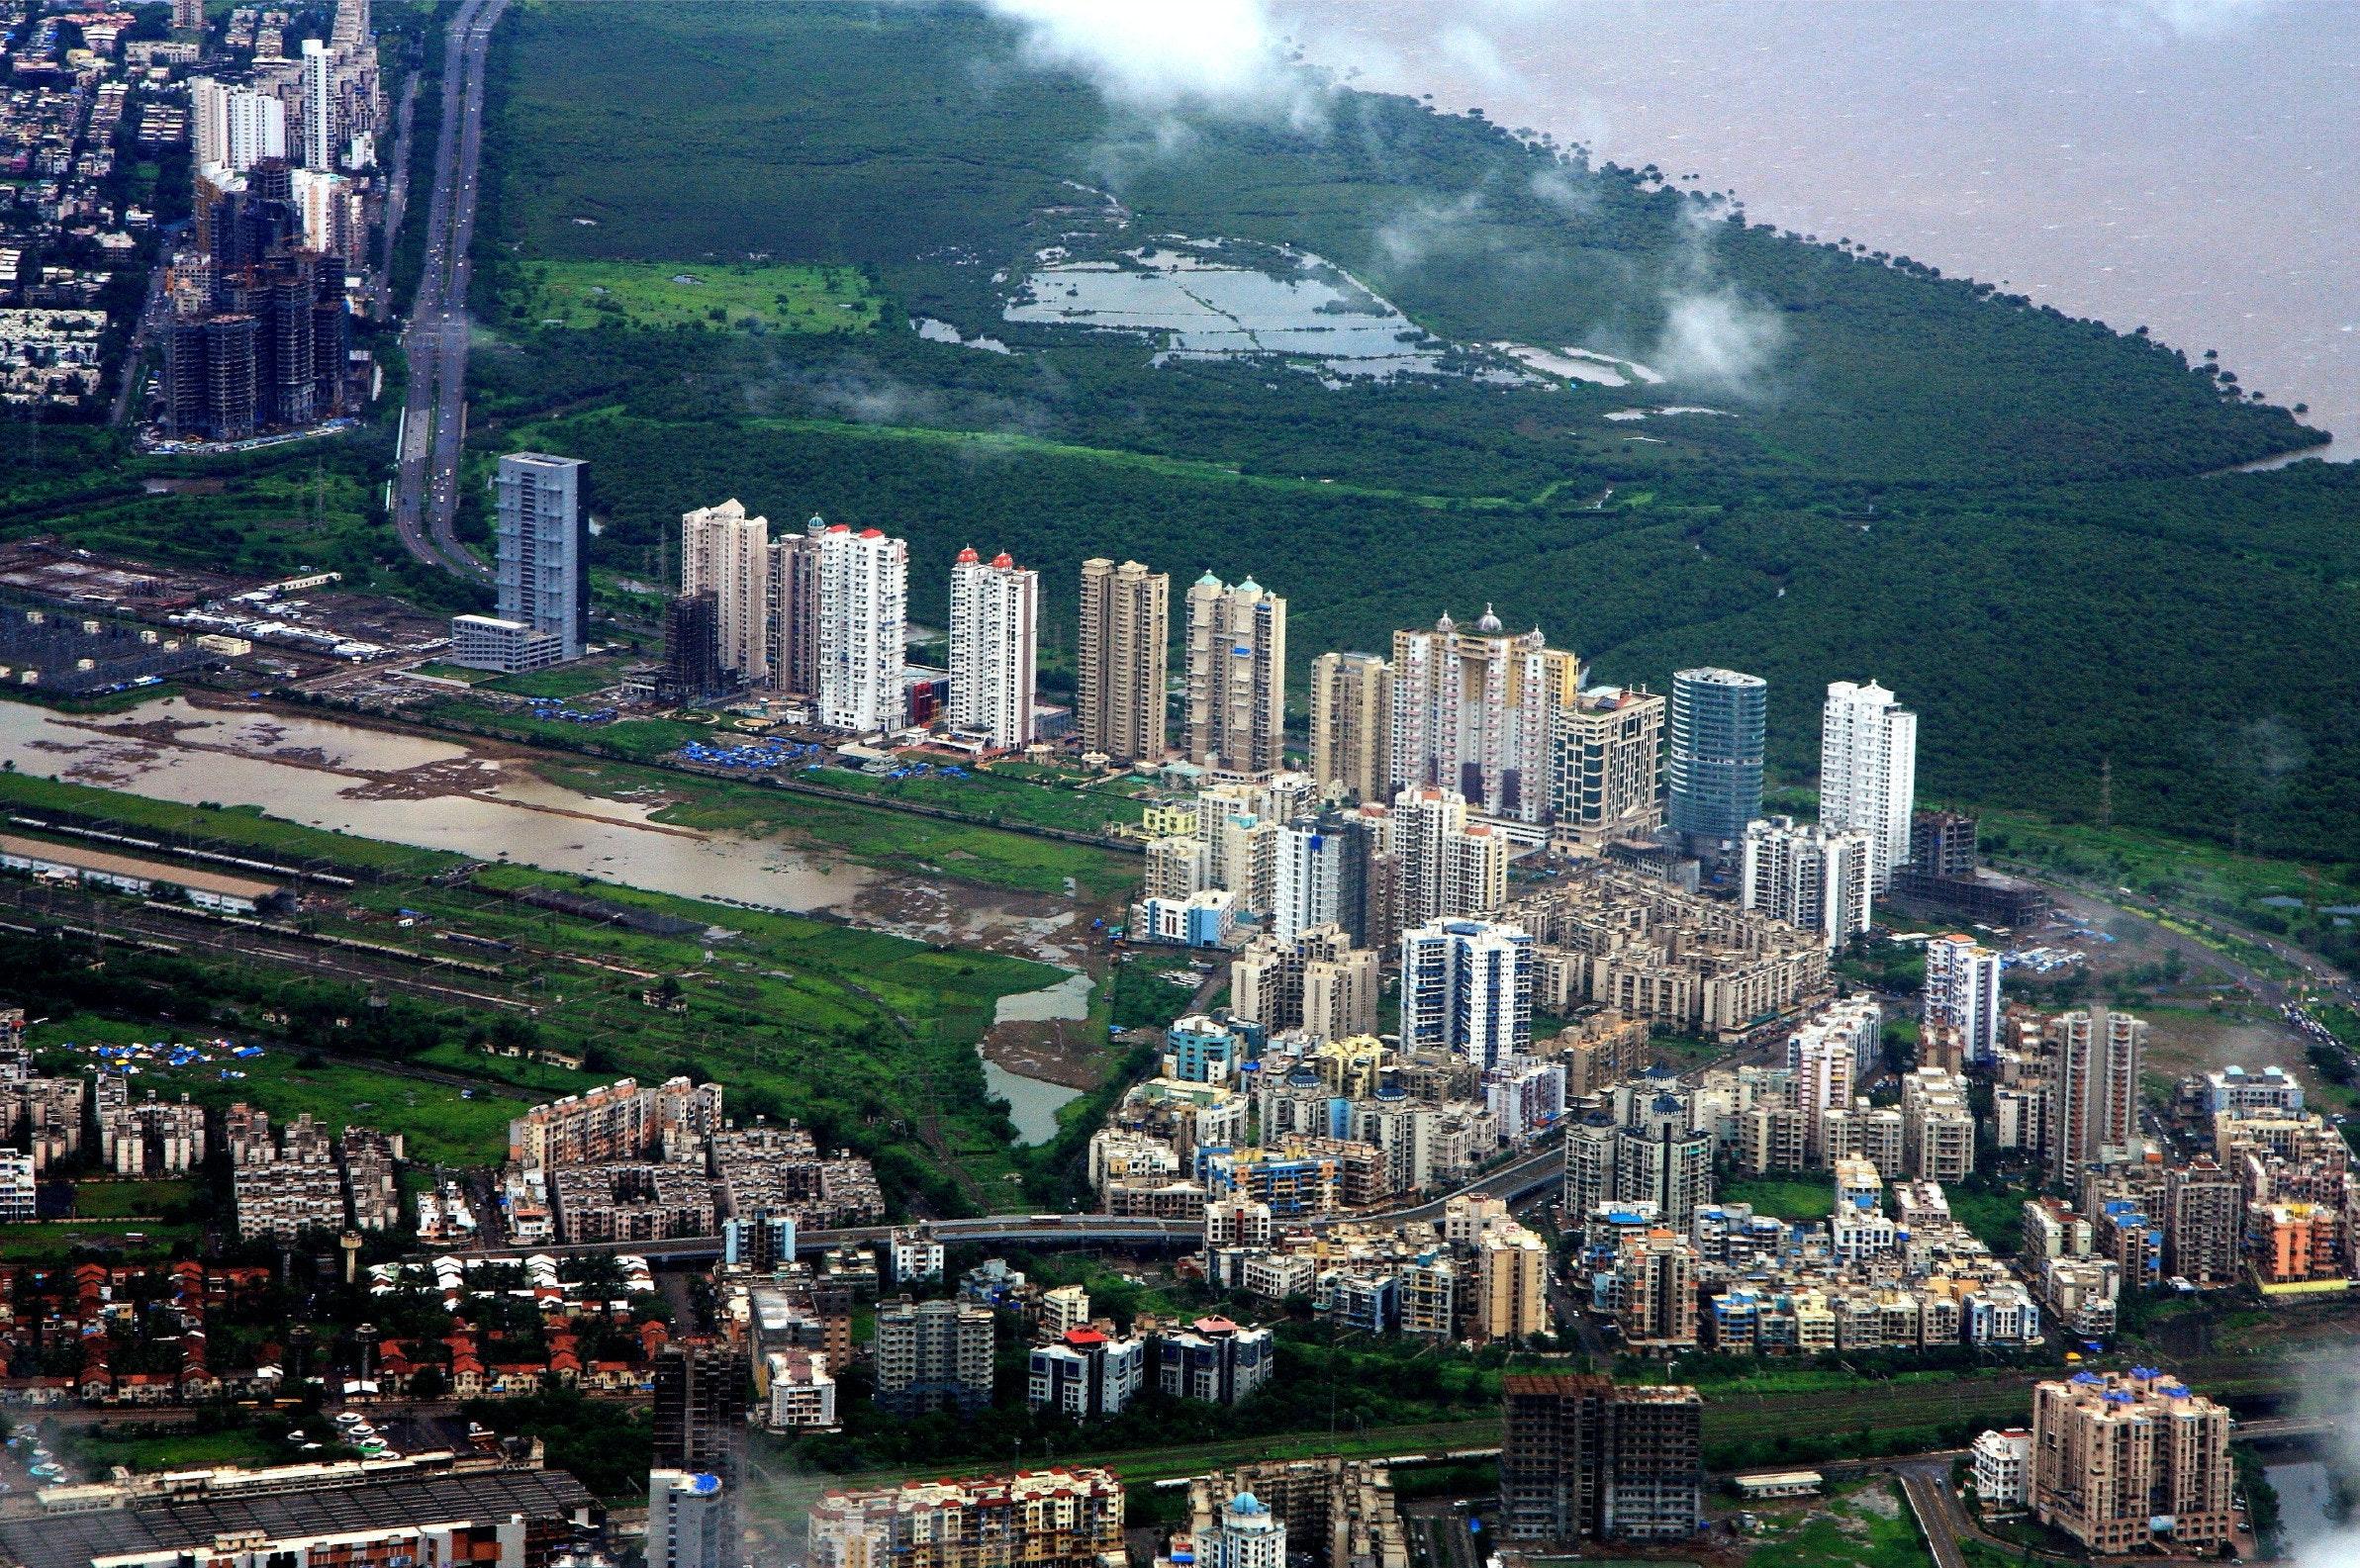 Central economic region: characteristics, cities, problems 88